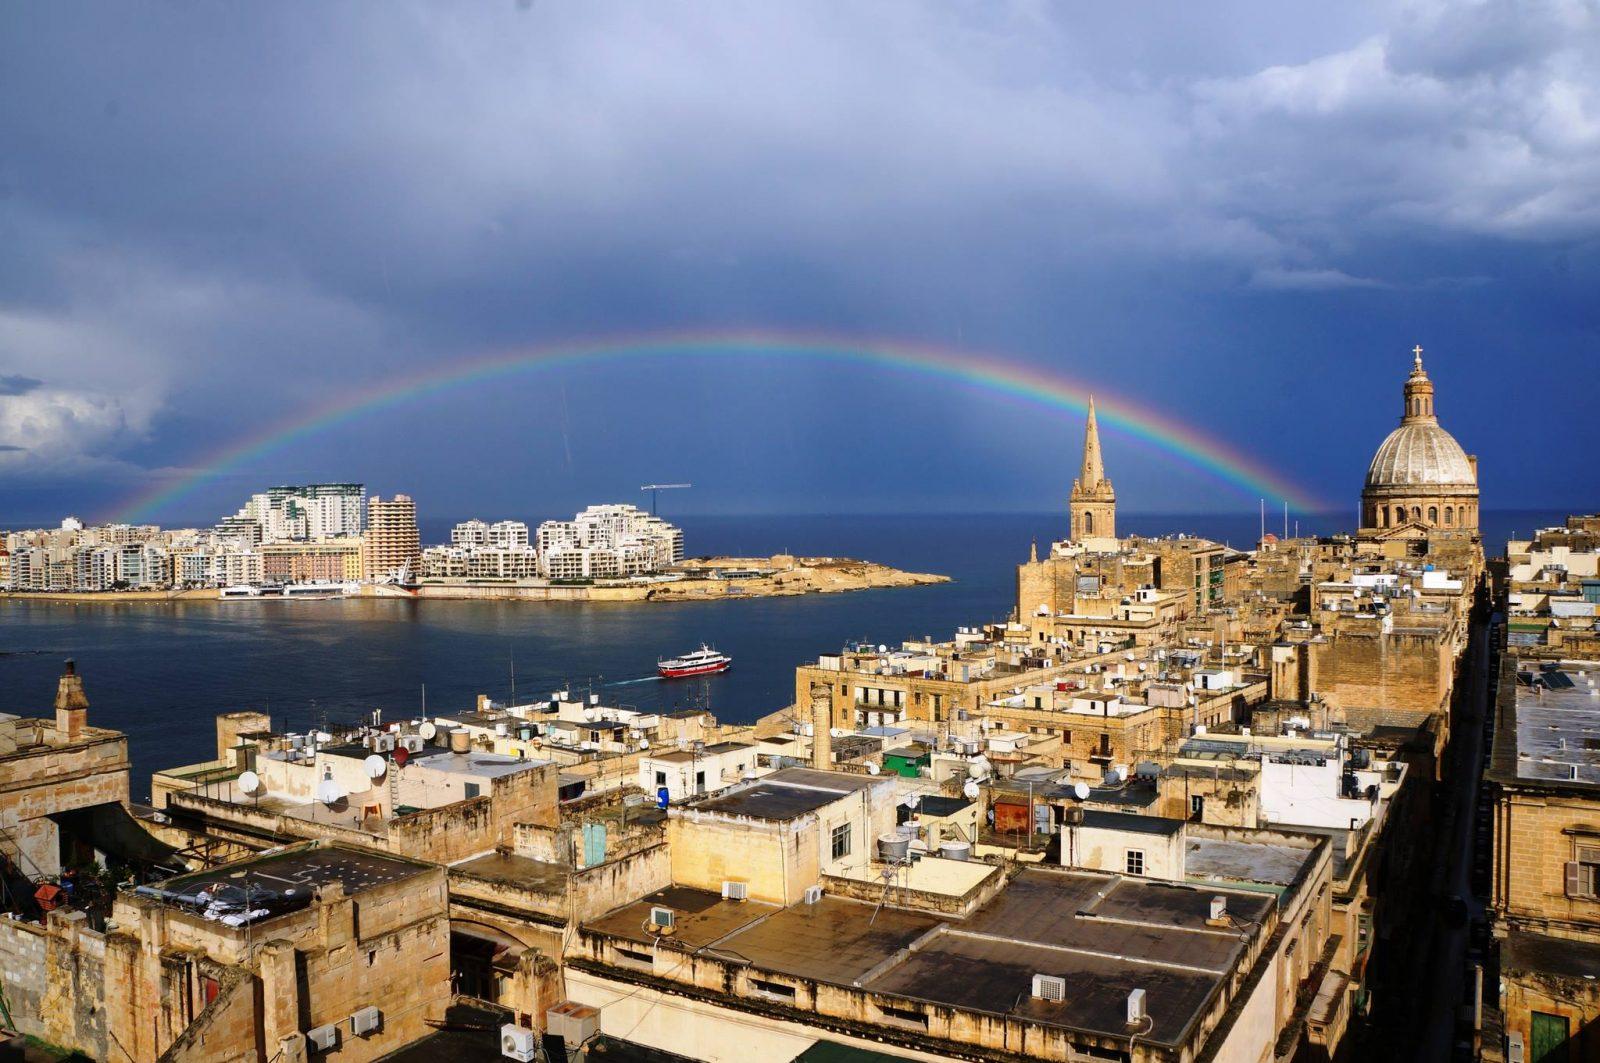 Rainbow above Sliema and Valletta view